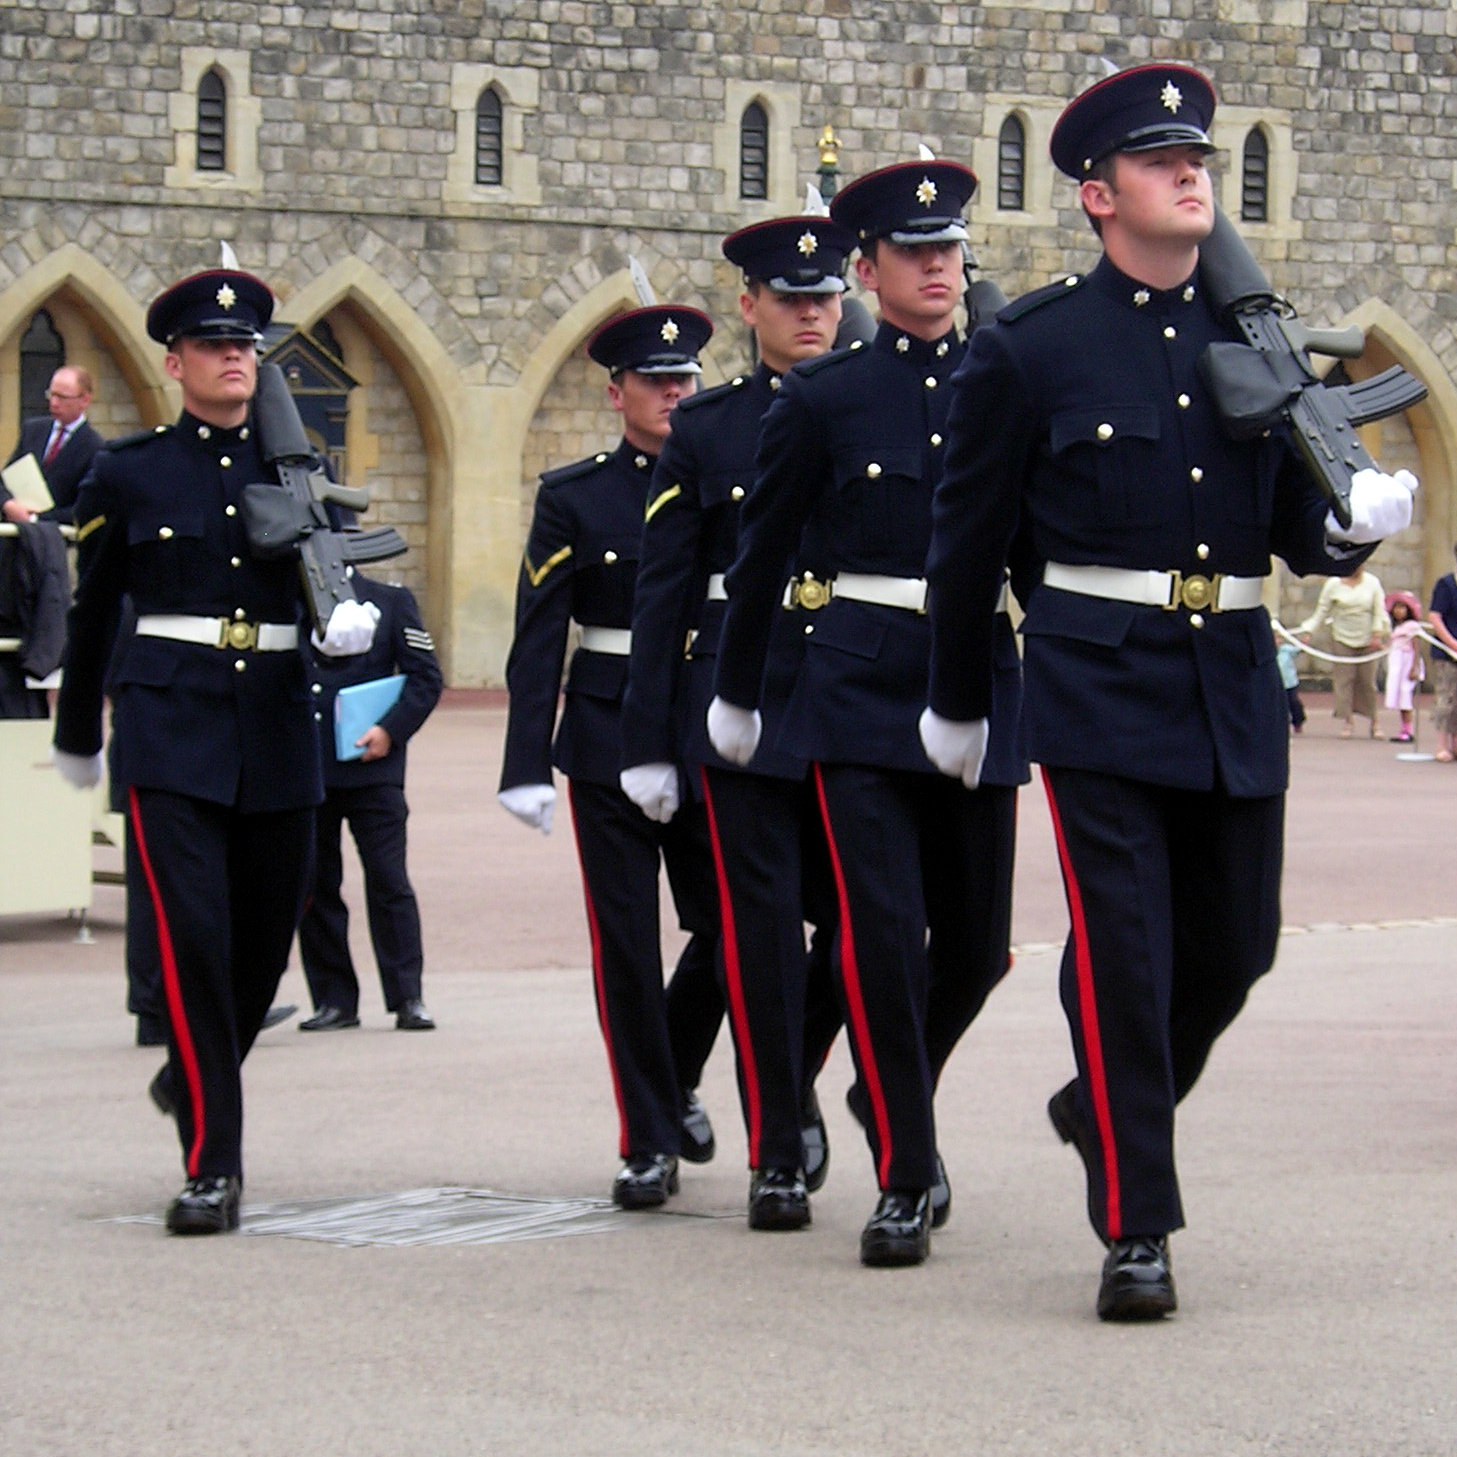 Uniforms of the British Army   Military Wiki   FANDOM powered by Wikia